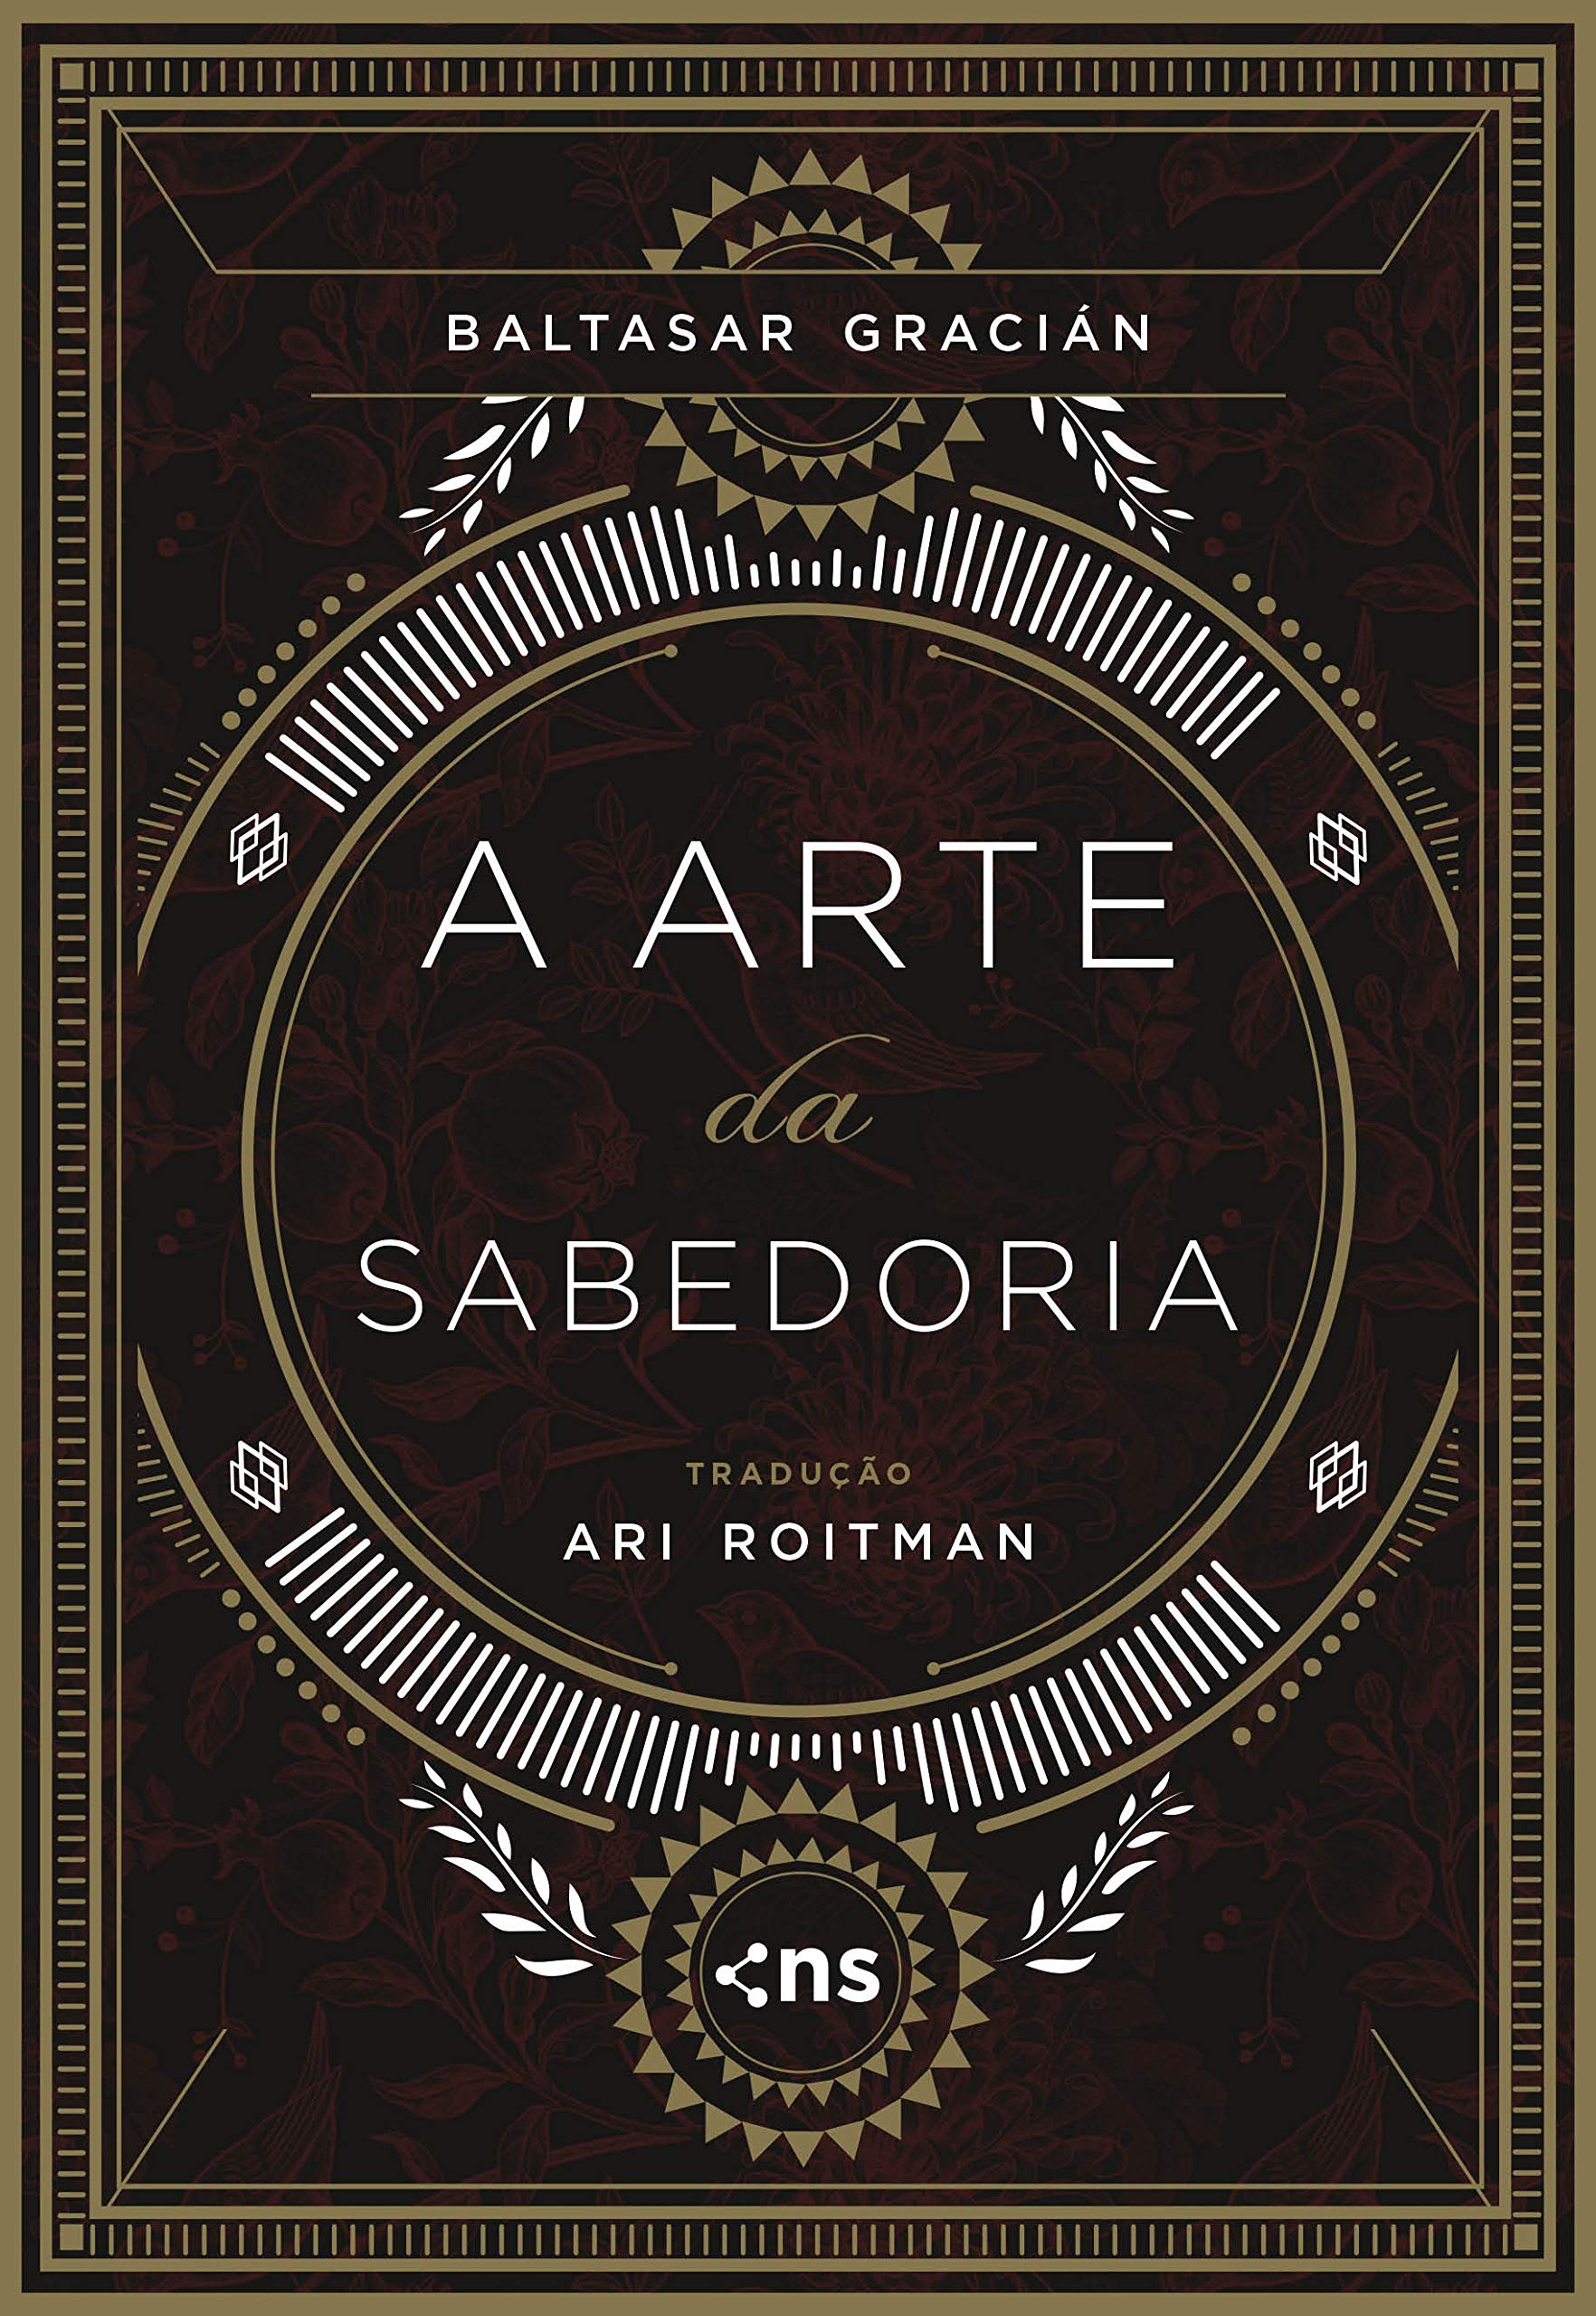 Livro 'A Arte da Sabedoria' de Baltasar Gracián